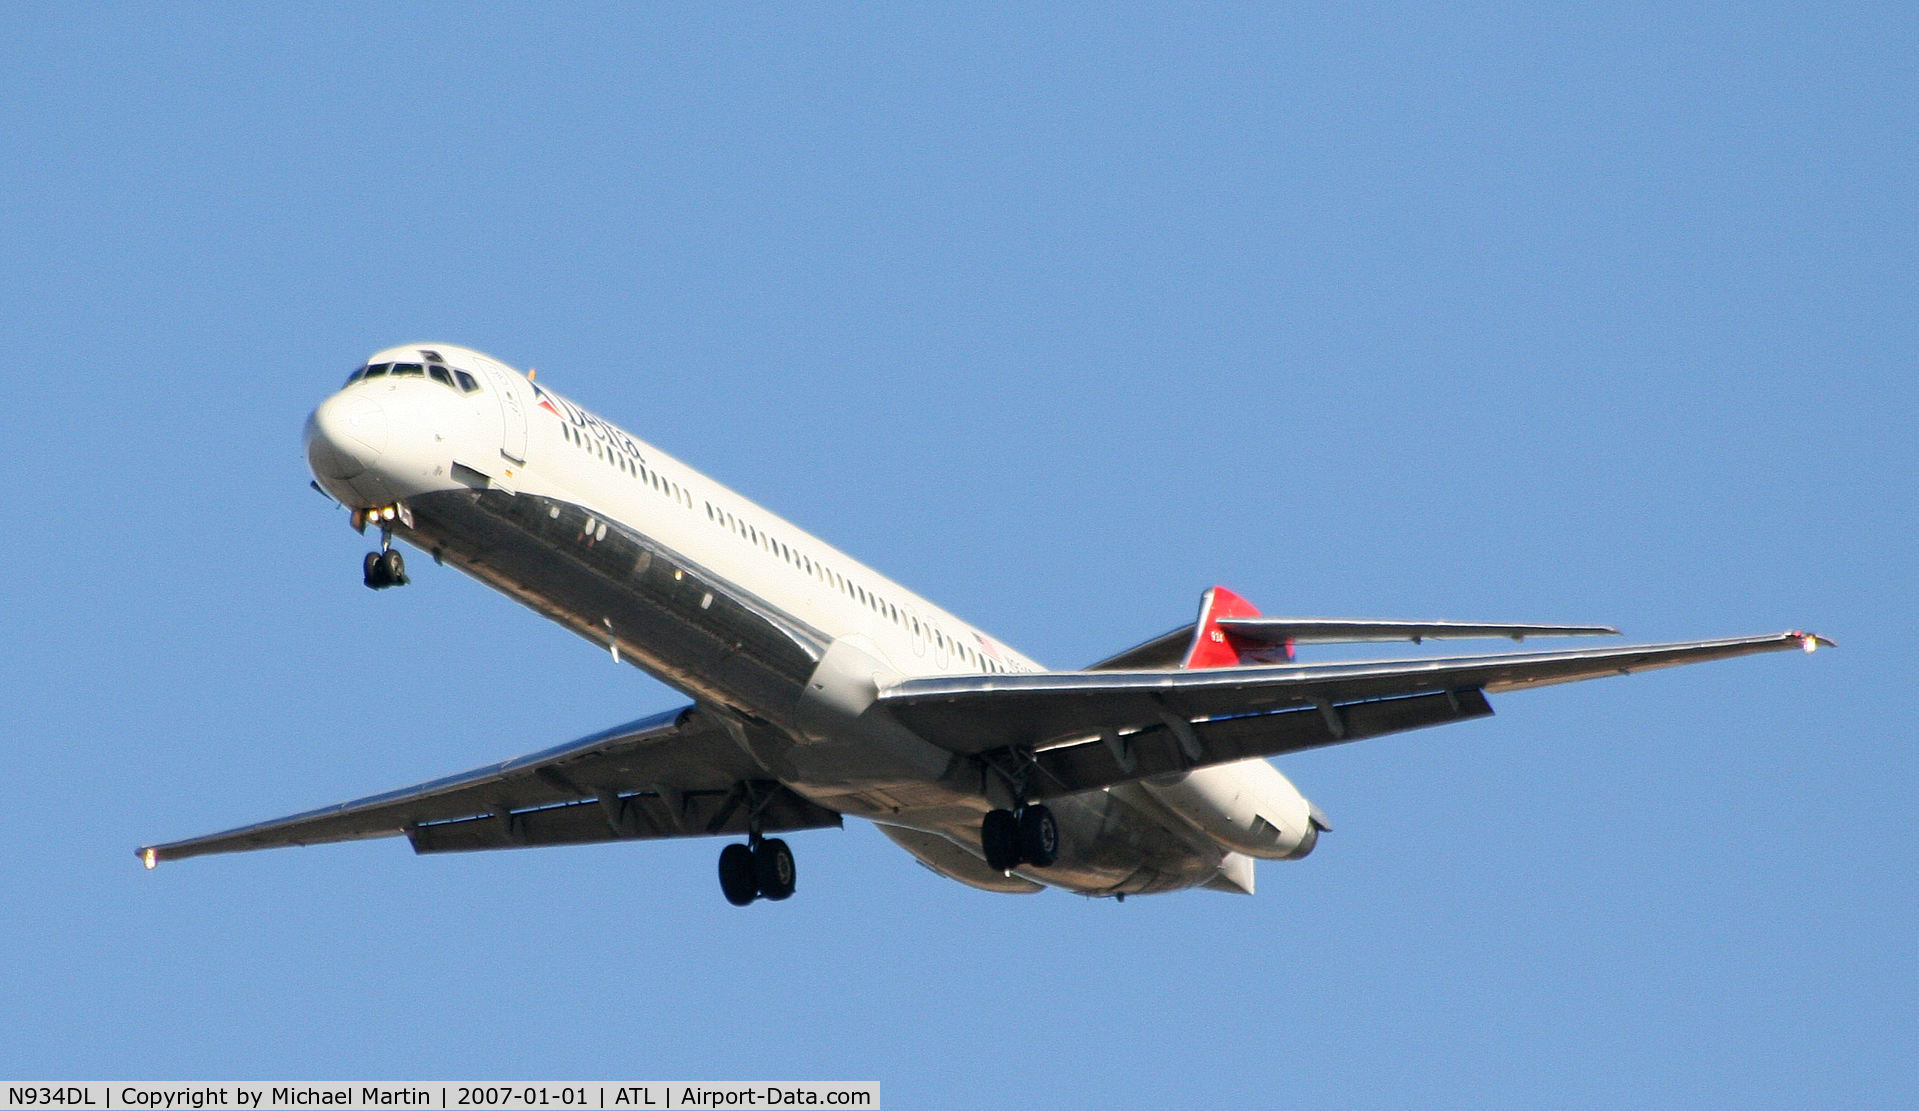 N934DL, 1989 McDonnell Douglas MD-88 C/N 49721, On final for Runway 26L